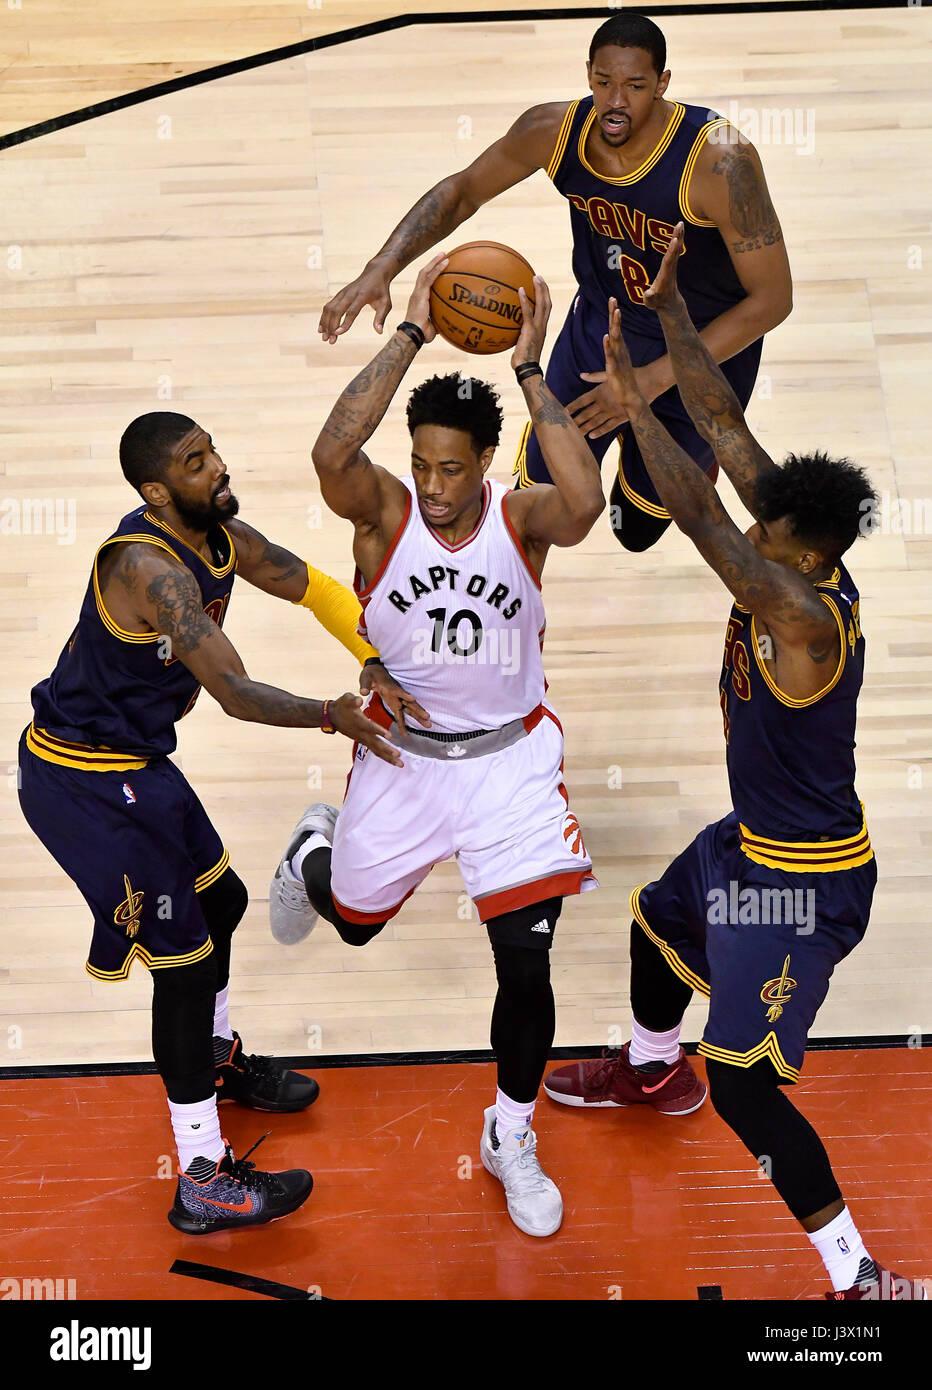 4638e673e98f Toronto Raptors Stock Photos   Toronto Raptors Stock Images - Alamy